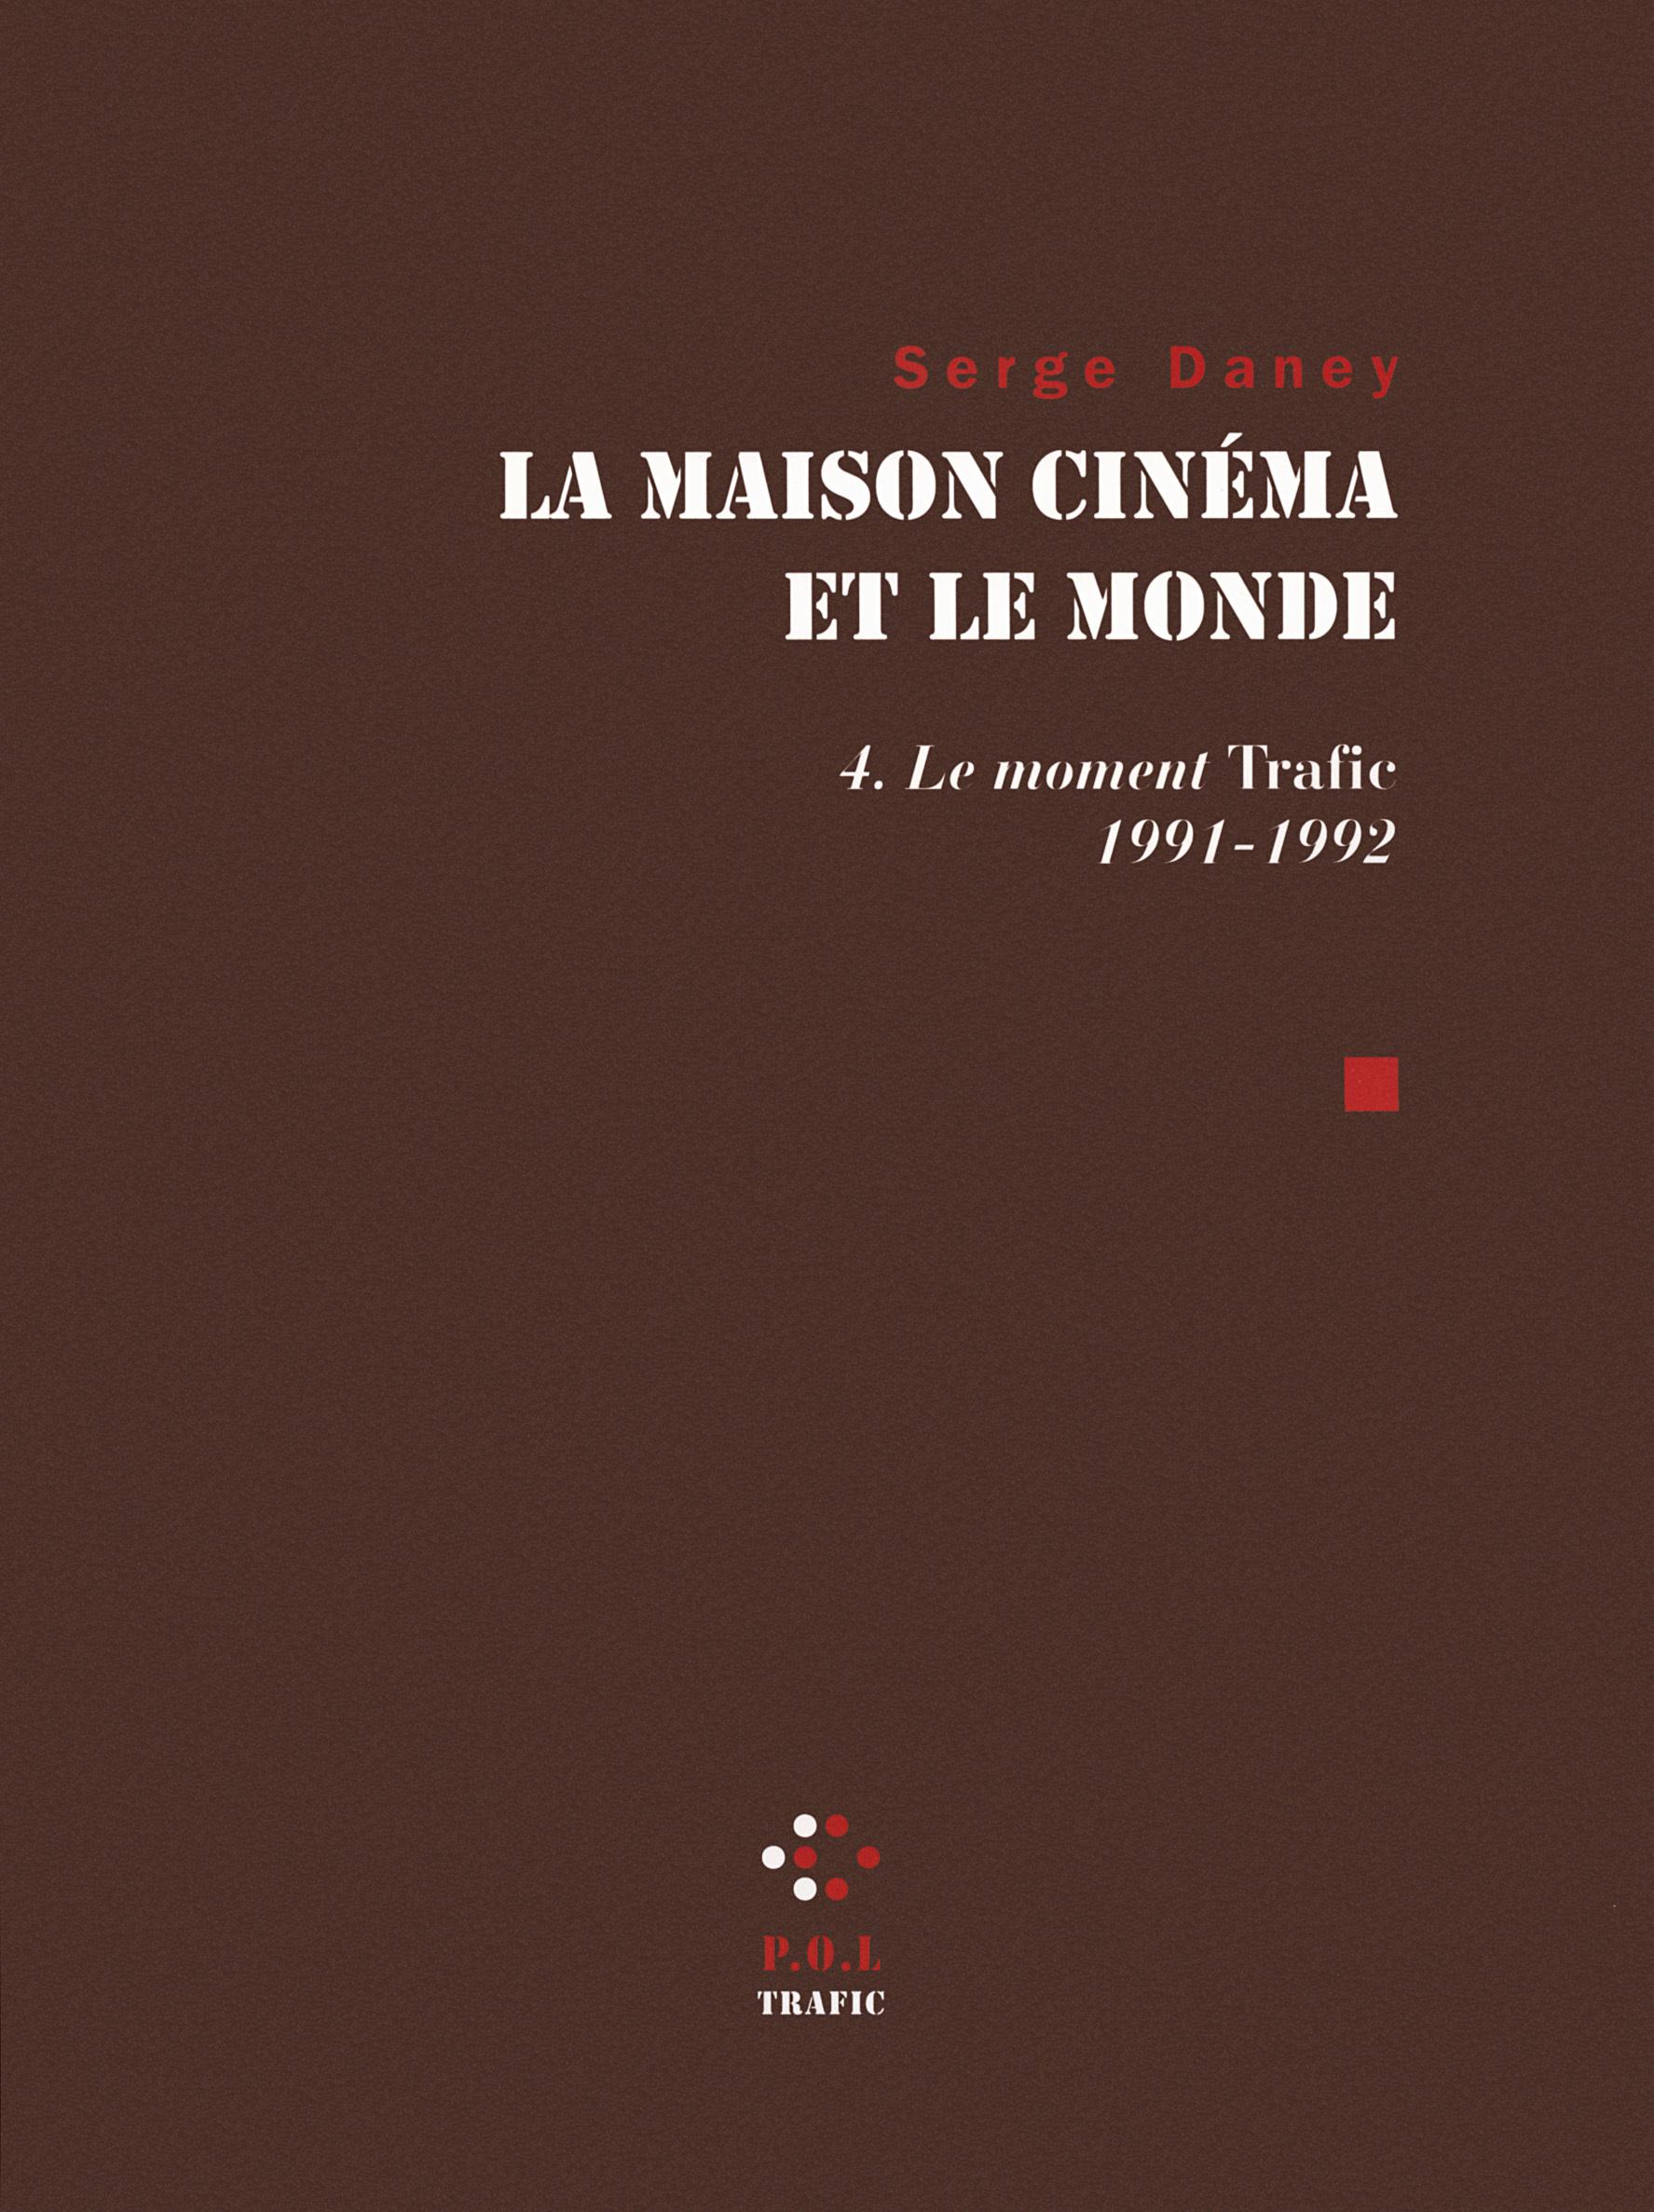 LA MAISON CINEMA ET LE MONDE (TOME 4-LE MOMENT  TRAFIC  (1991-1992))